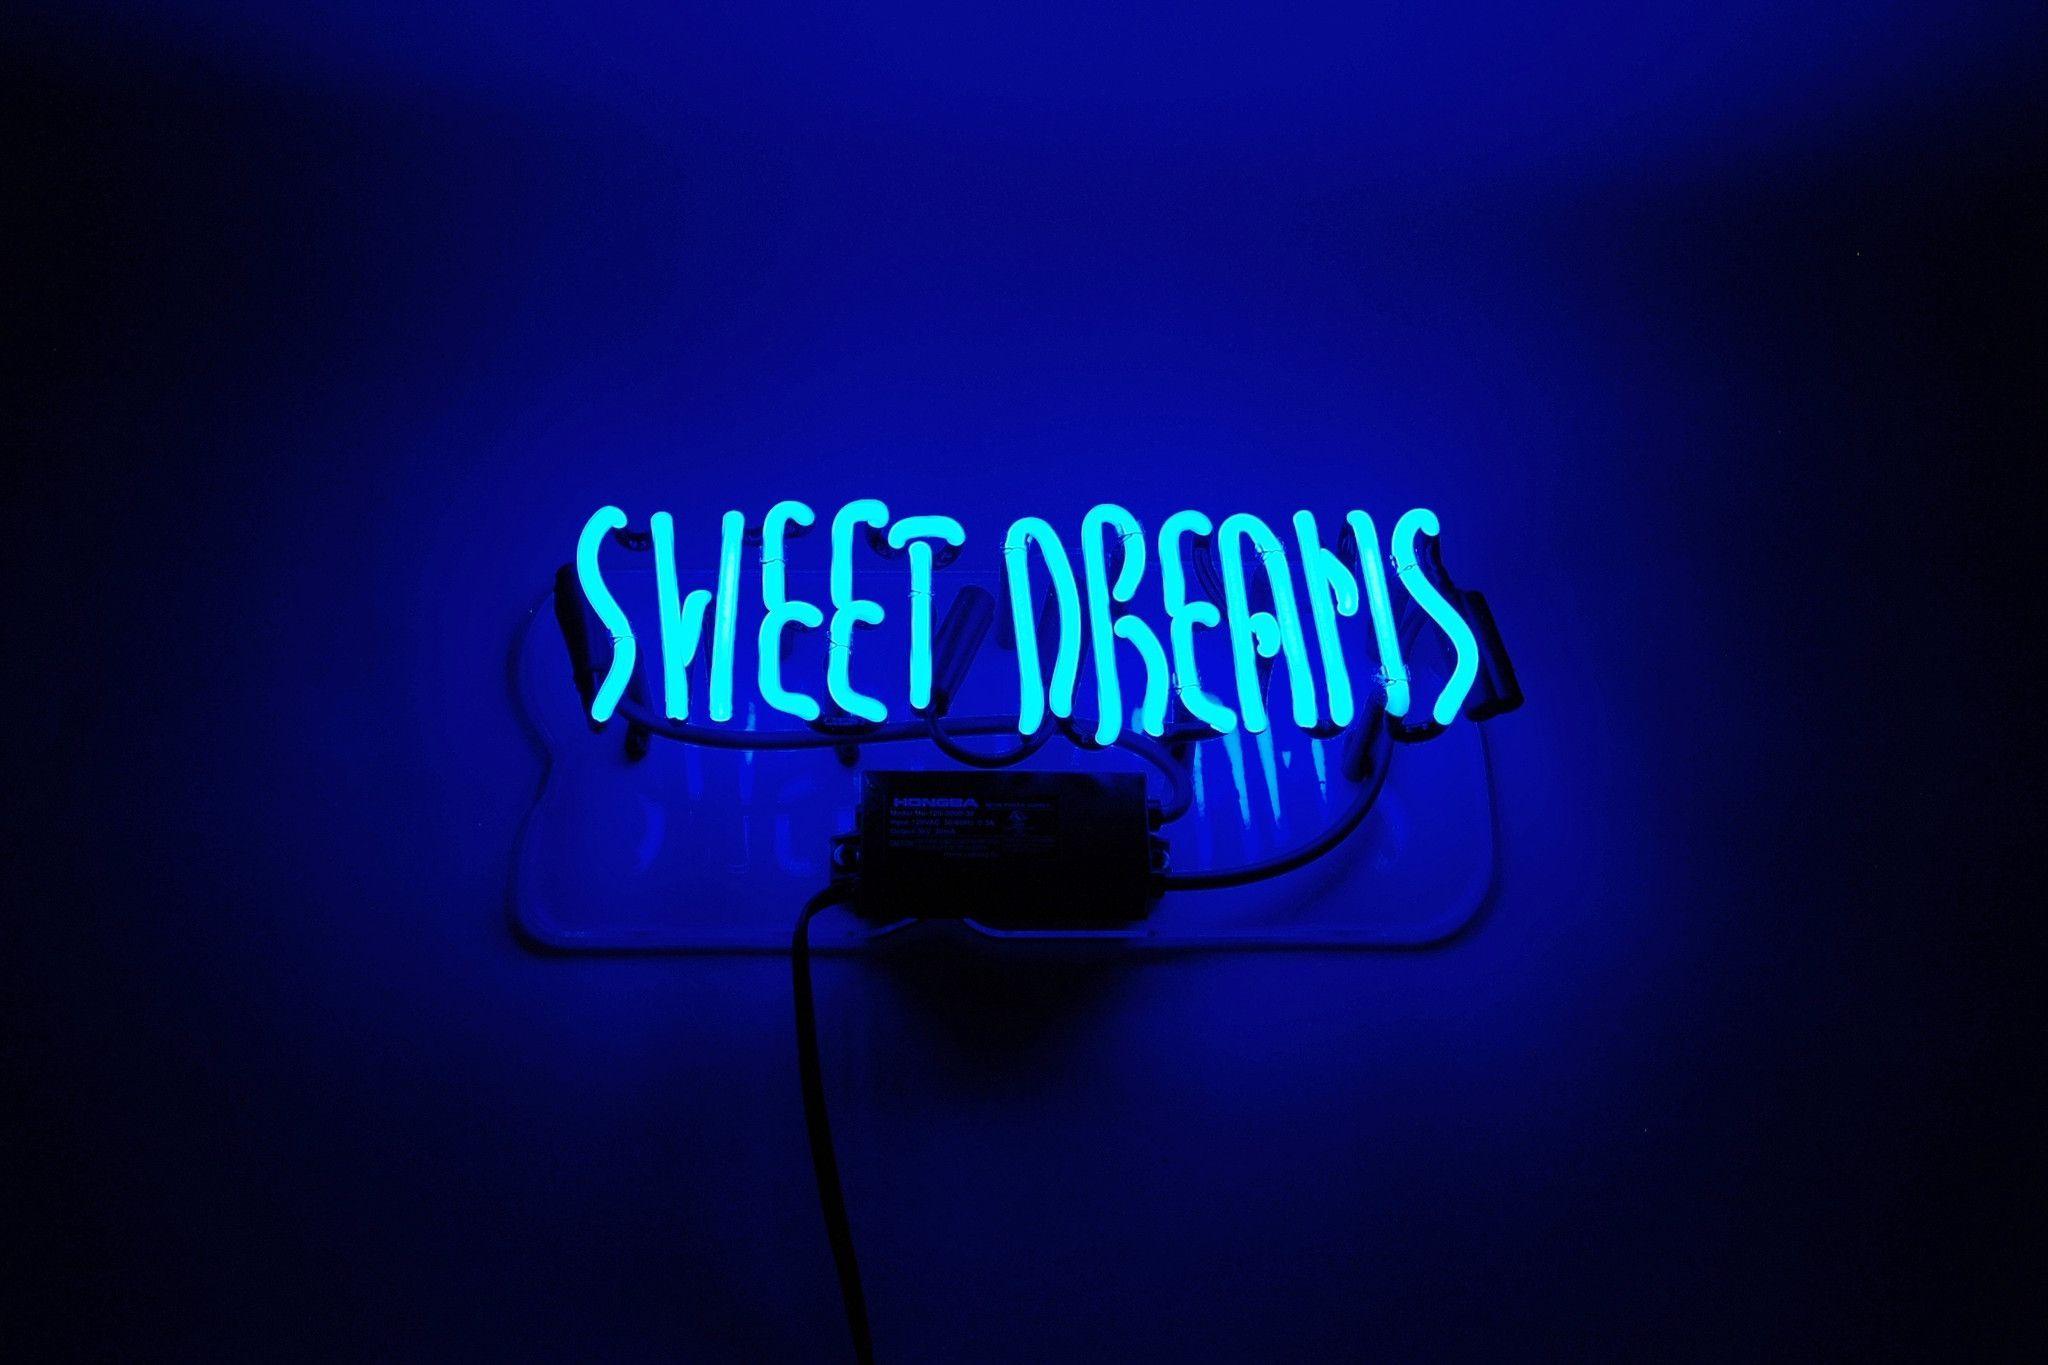 sweet dreams neon sign wallpaper 66618